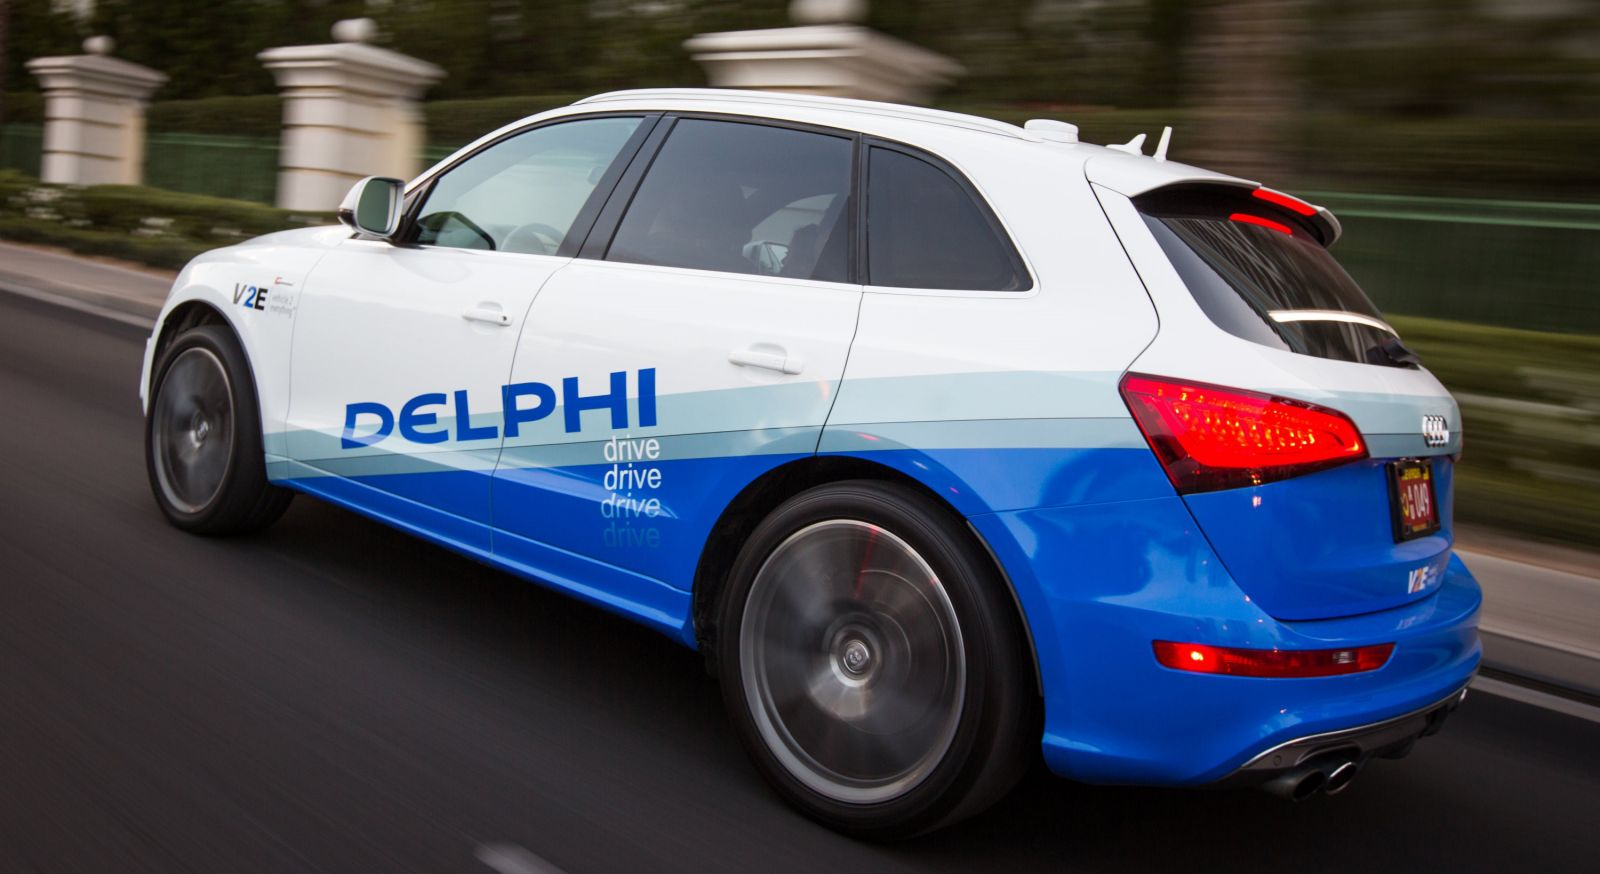 Delphi coche vehículo autonomo conectado